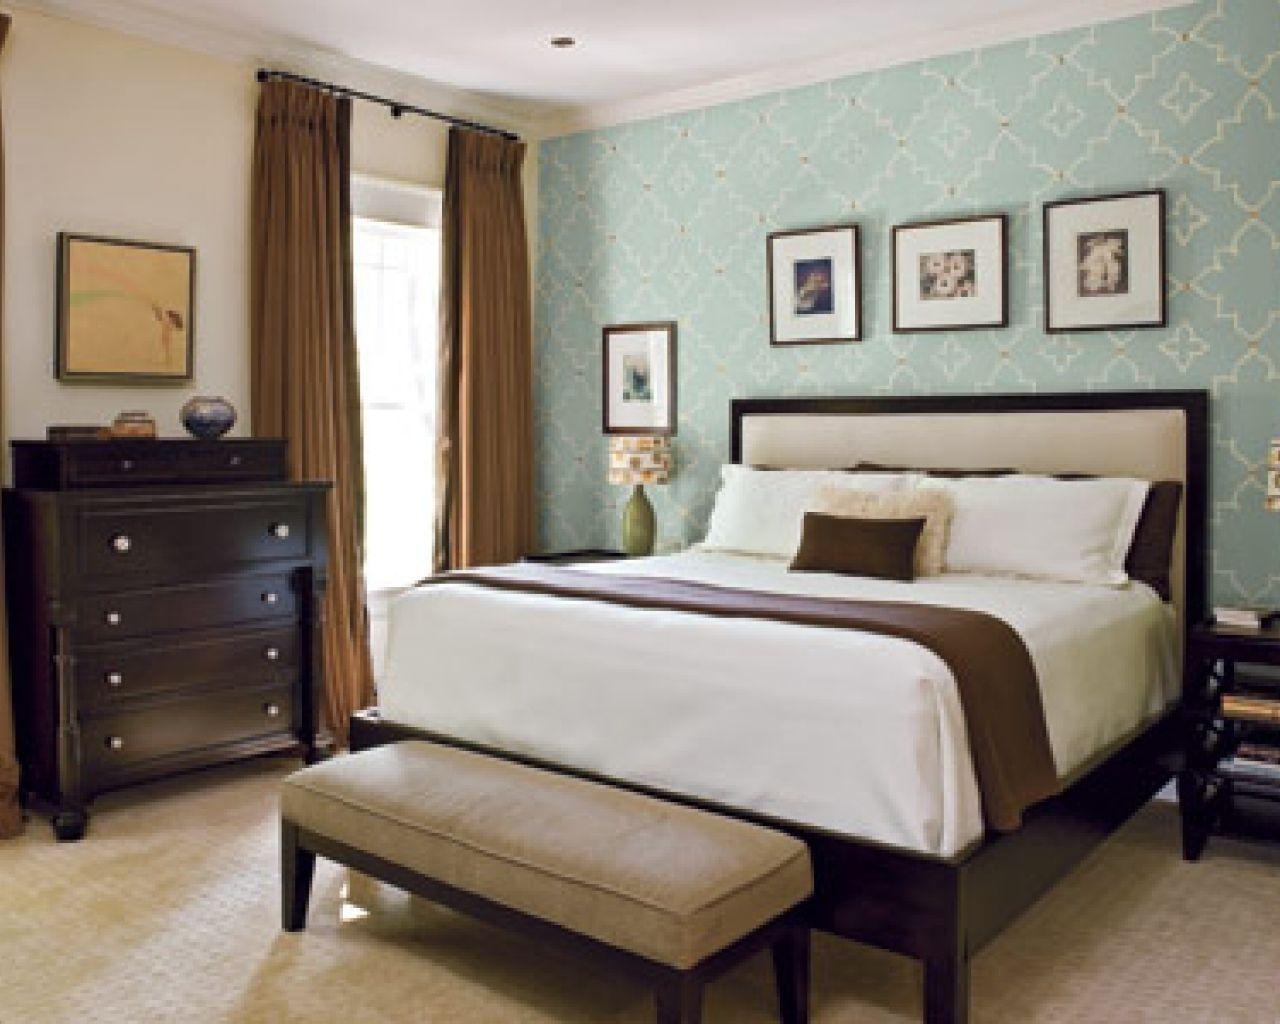 Schlafzimmer Akzent Zauberstab Farbe Ideen Mounted Braun Holz